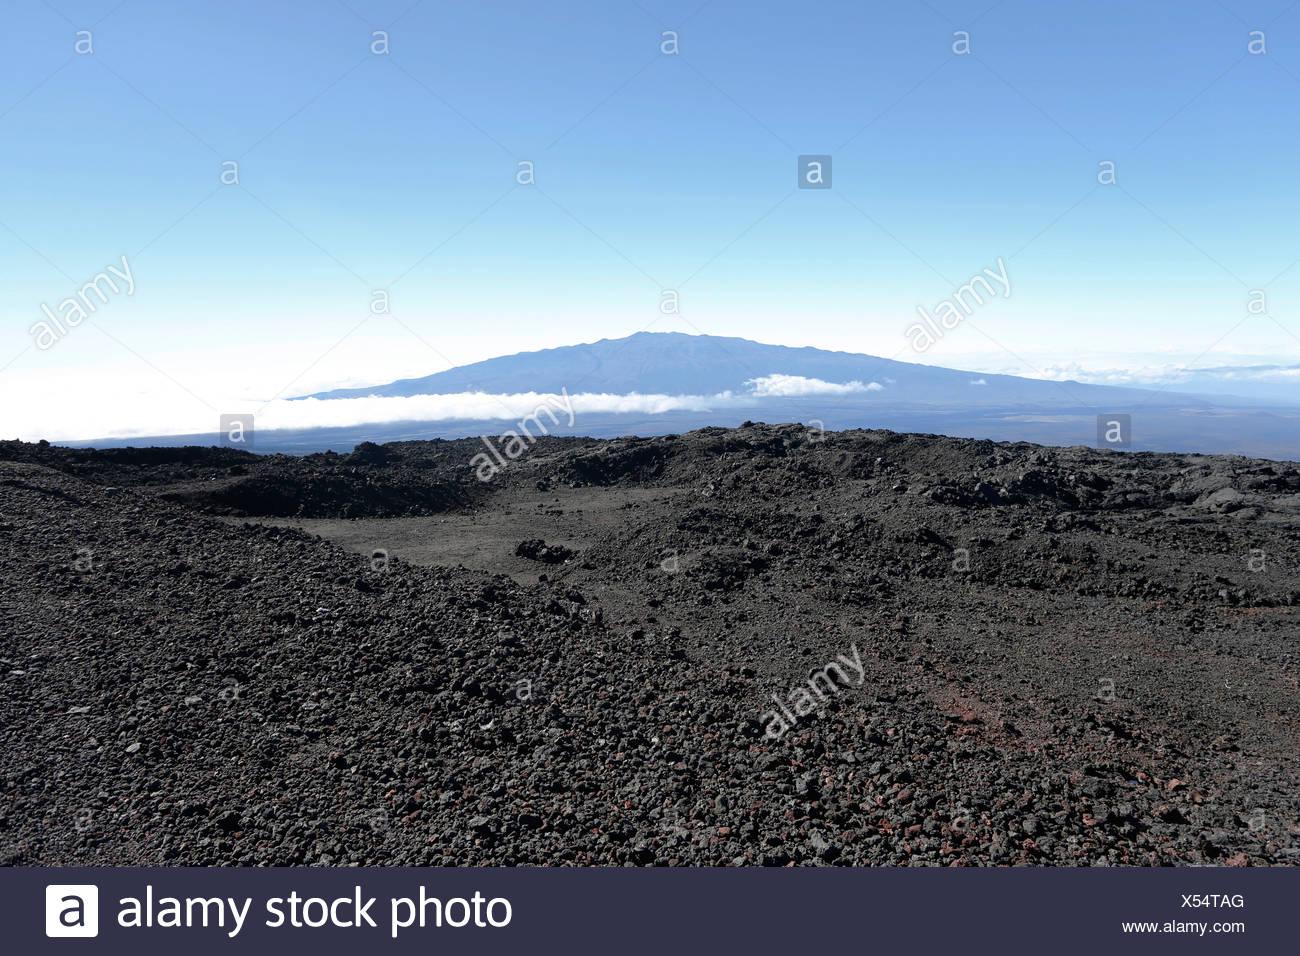 Summit of the Mauna Keo volcano with lava of the Mauna Loa volcano, Big Island, Hawaii, USA - Stock Image